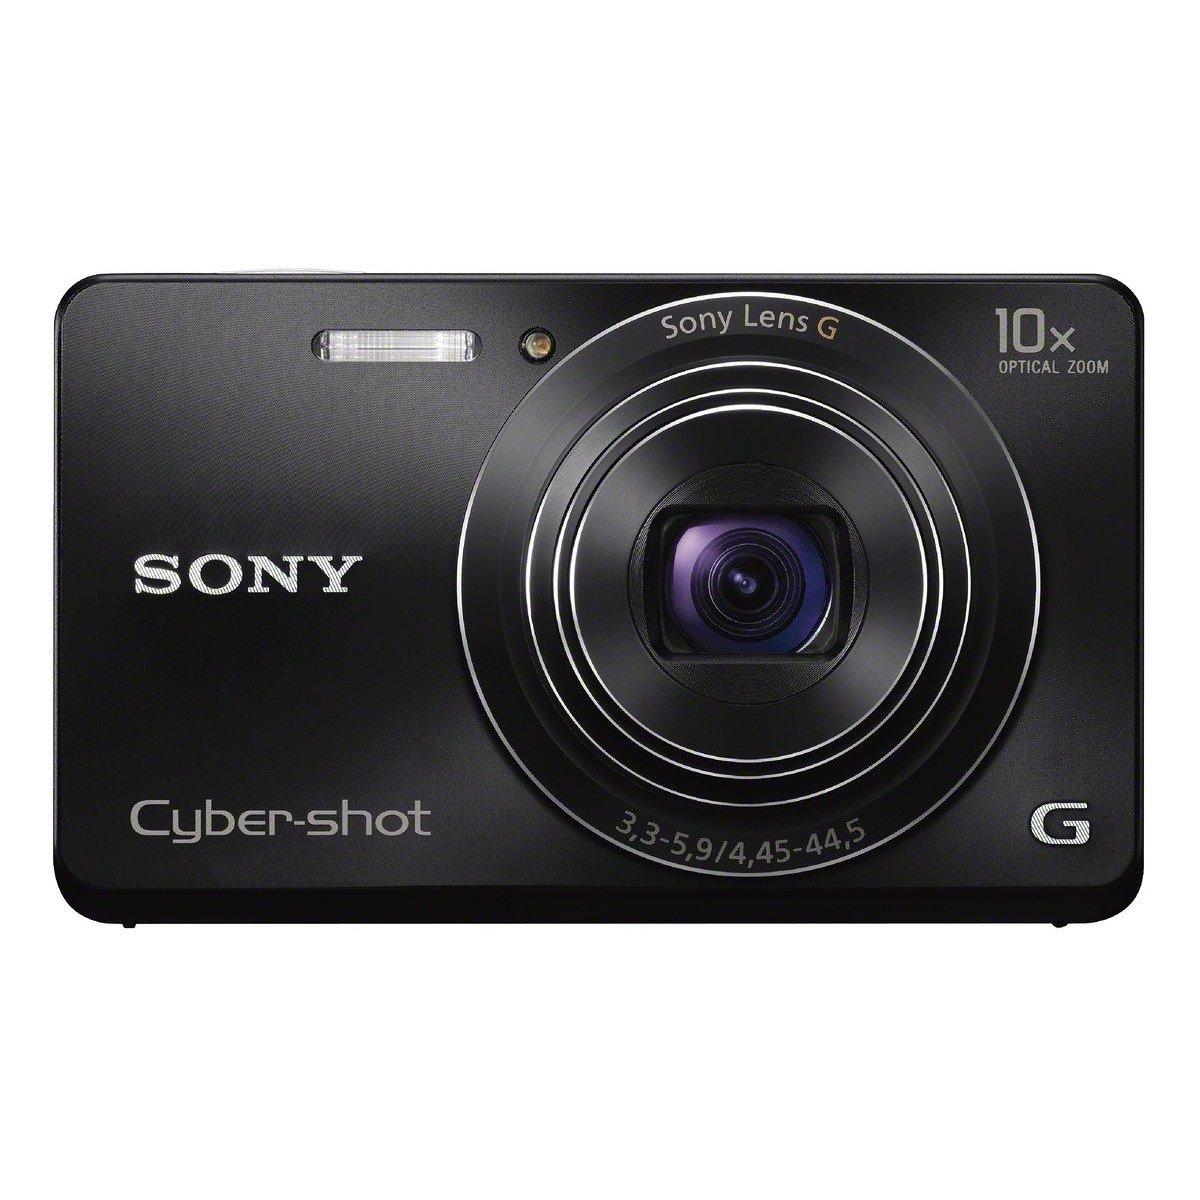 https://thetechjournal.com/wp-content/uploads/images/1210/1349266788-sony-cybershot-dscw690-161-mp-digital-camera--1.jpg